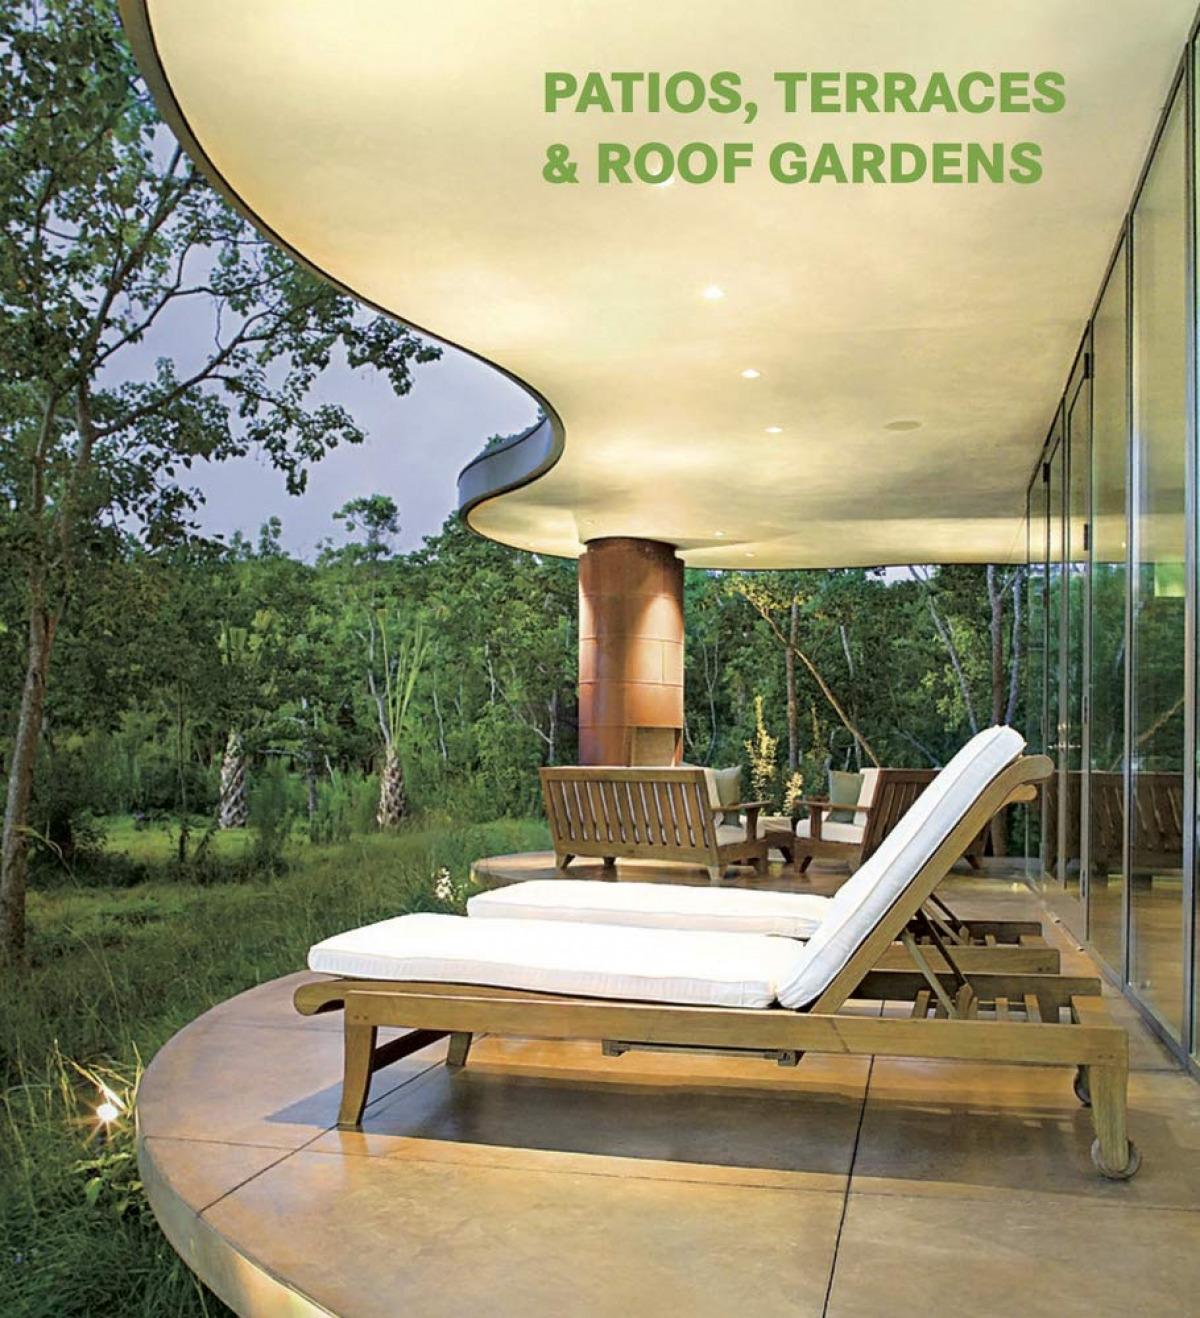 PATIOS, TERRACES &ROOF GARDENS 9783864075414